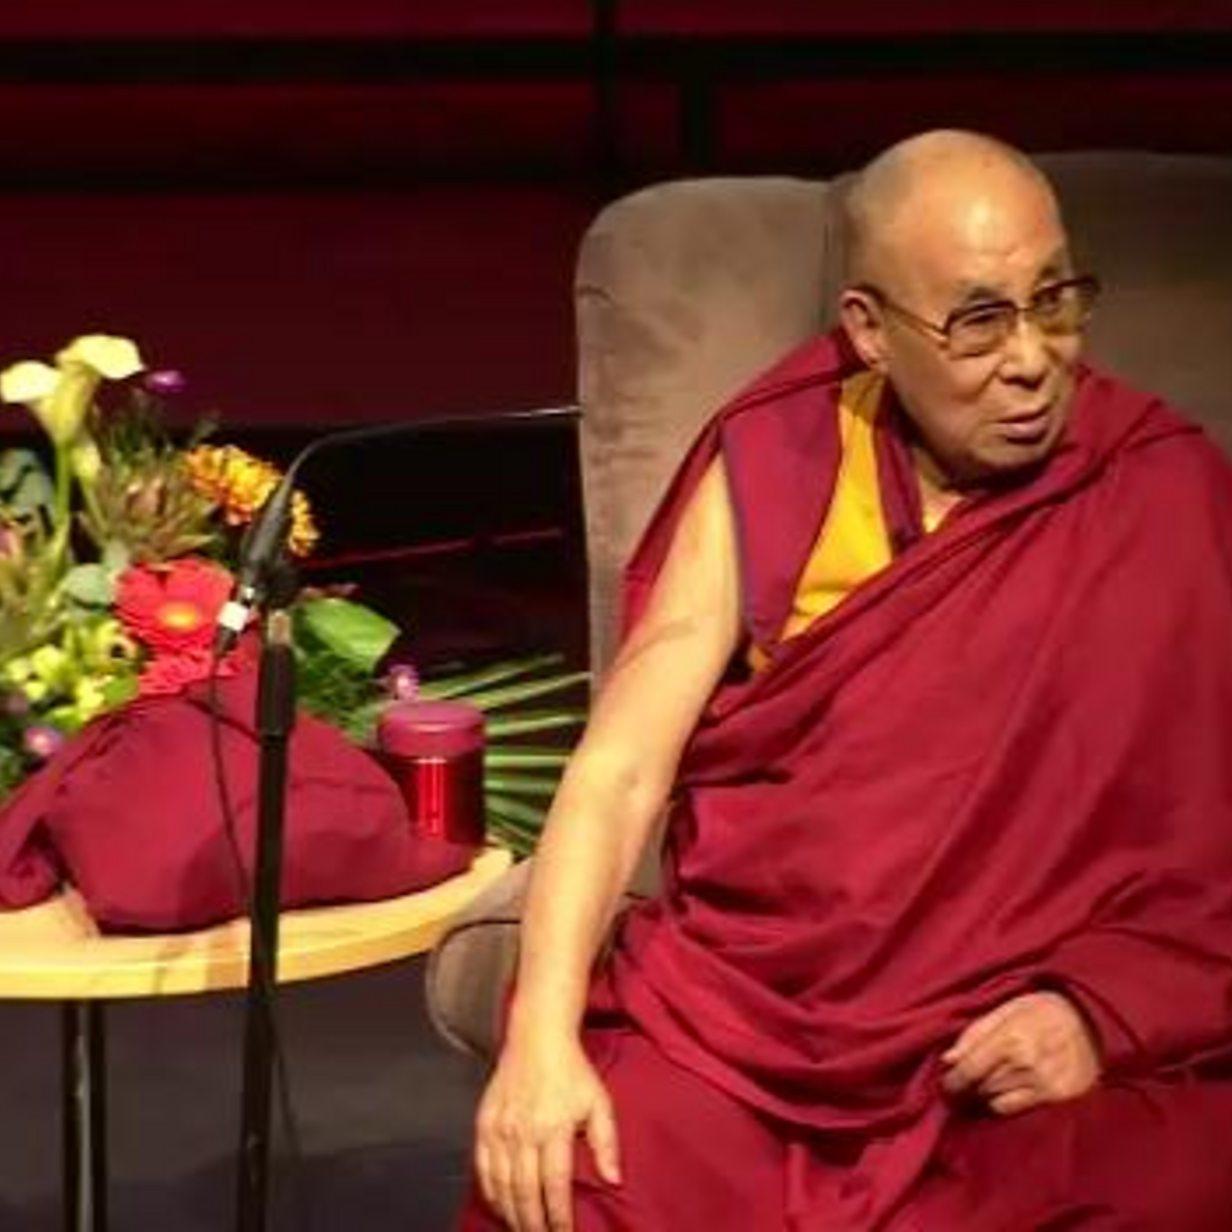 Dalai Lama Trump Has Lack Of Moral Principle Bbc News